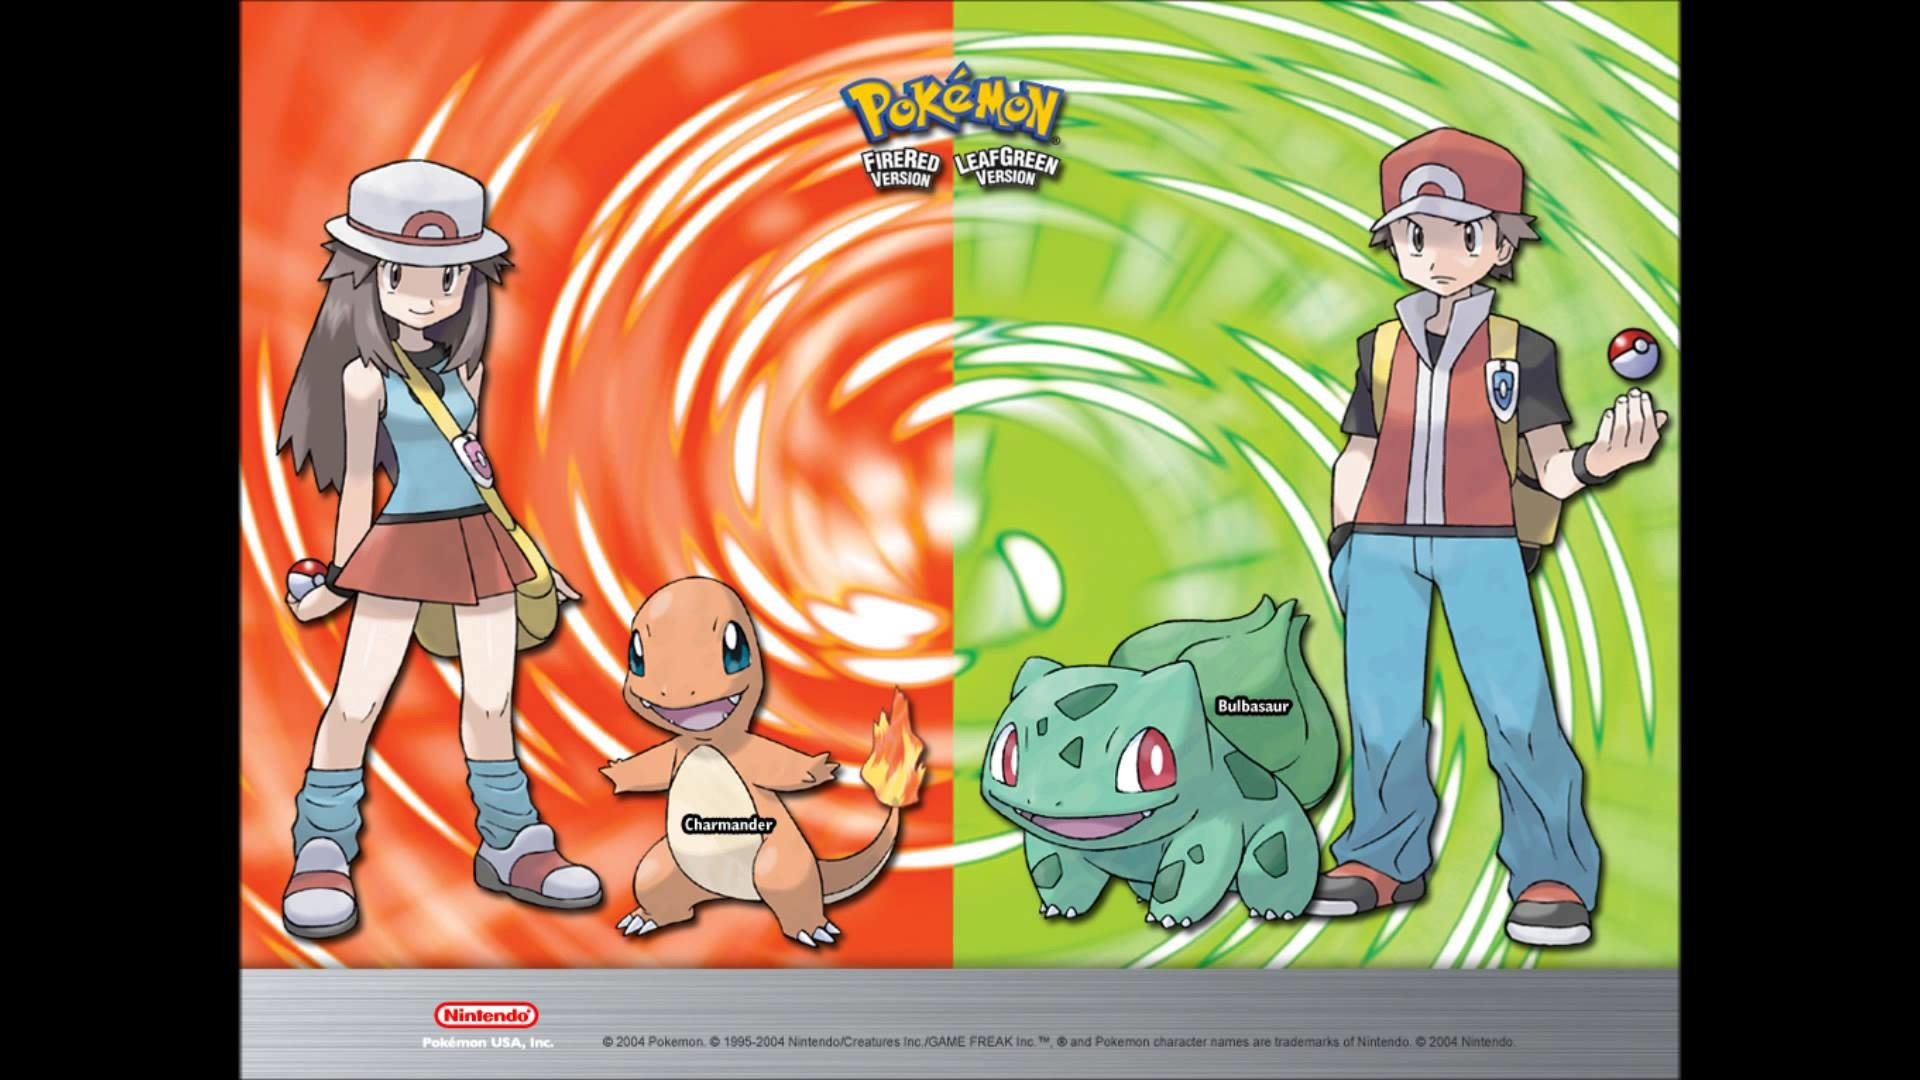 Pokemon Fire Red & Leaf Green OST